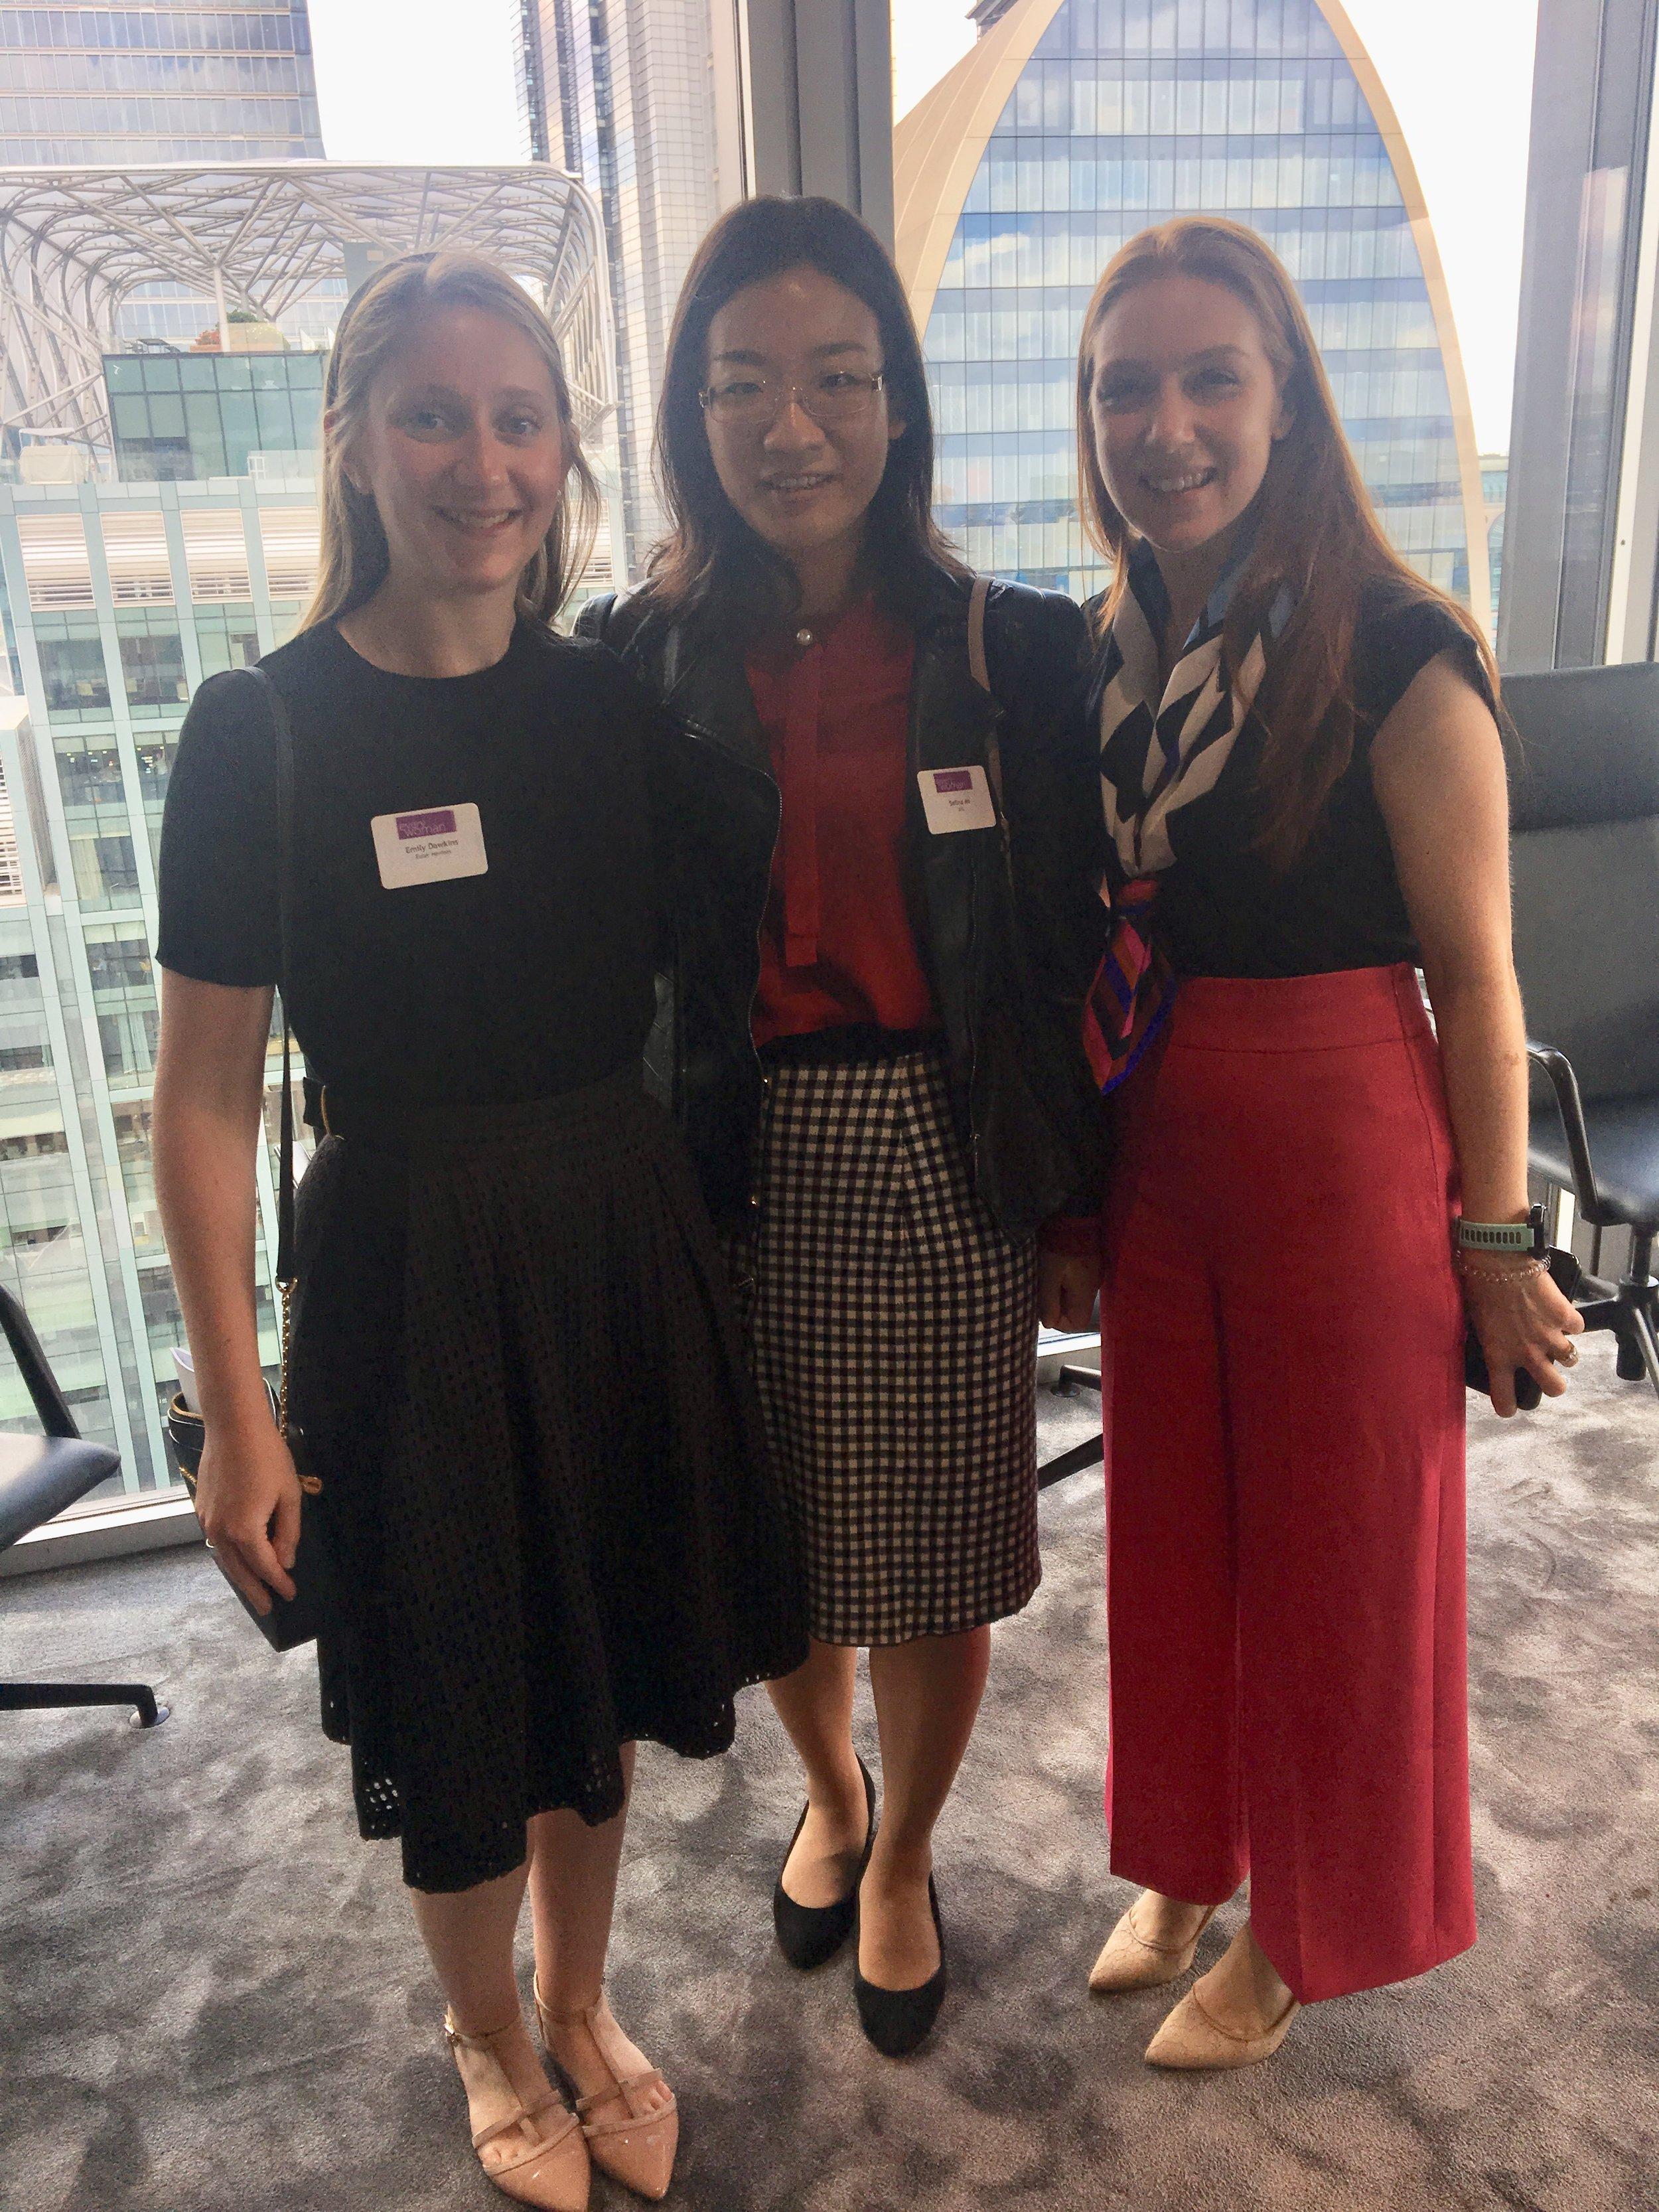 July 2019 - Everywoman in insurance forum 2019